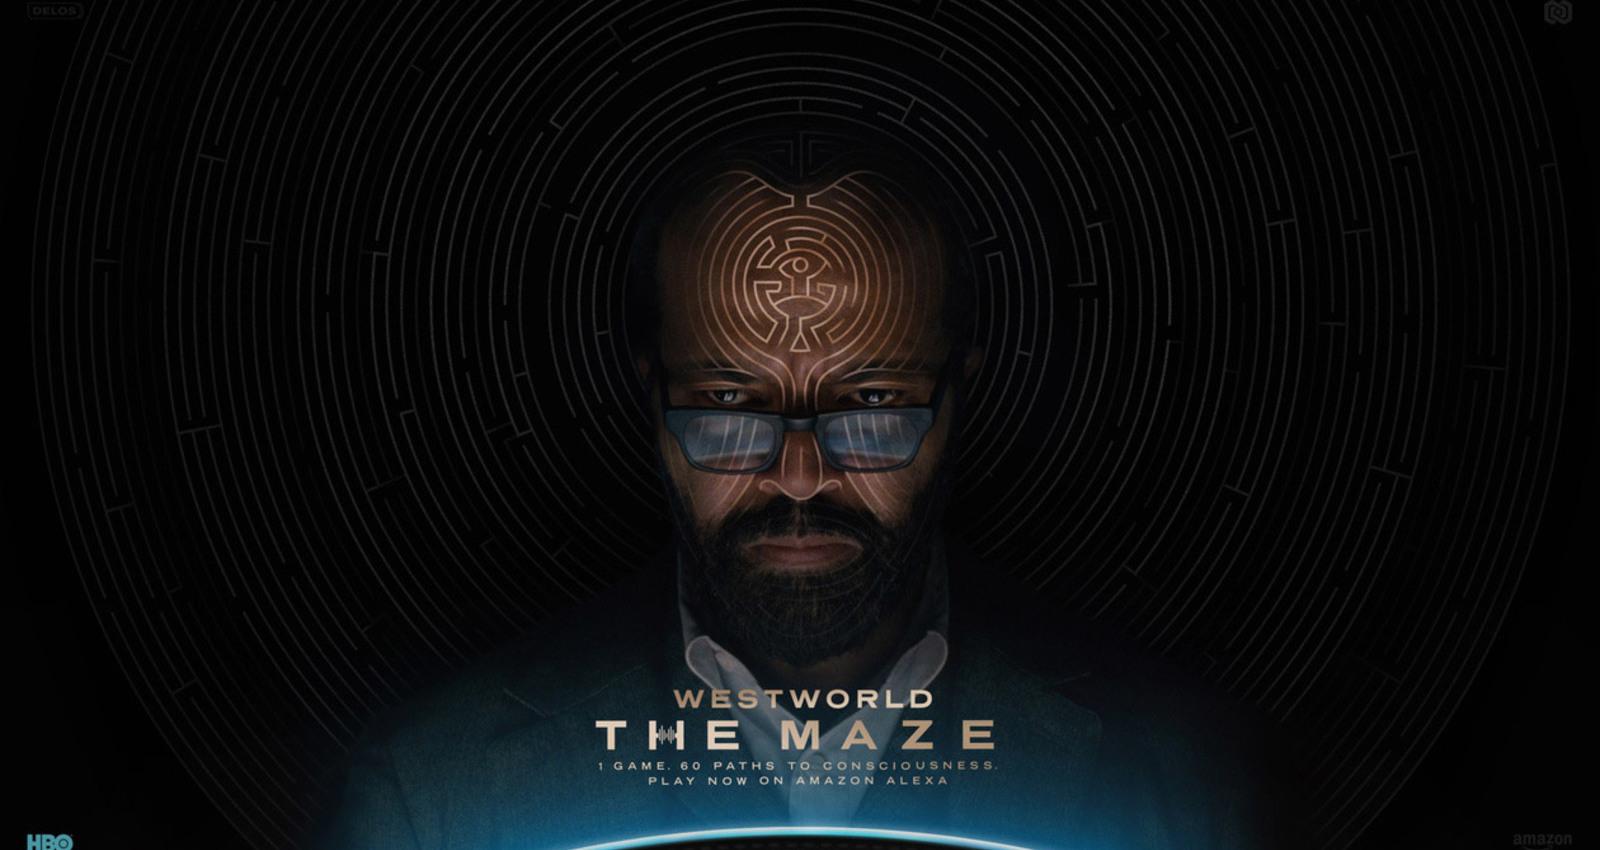 Westworld: The Maze